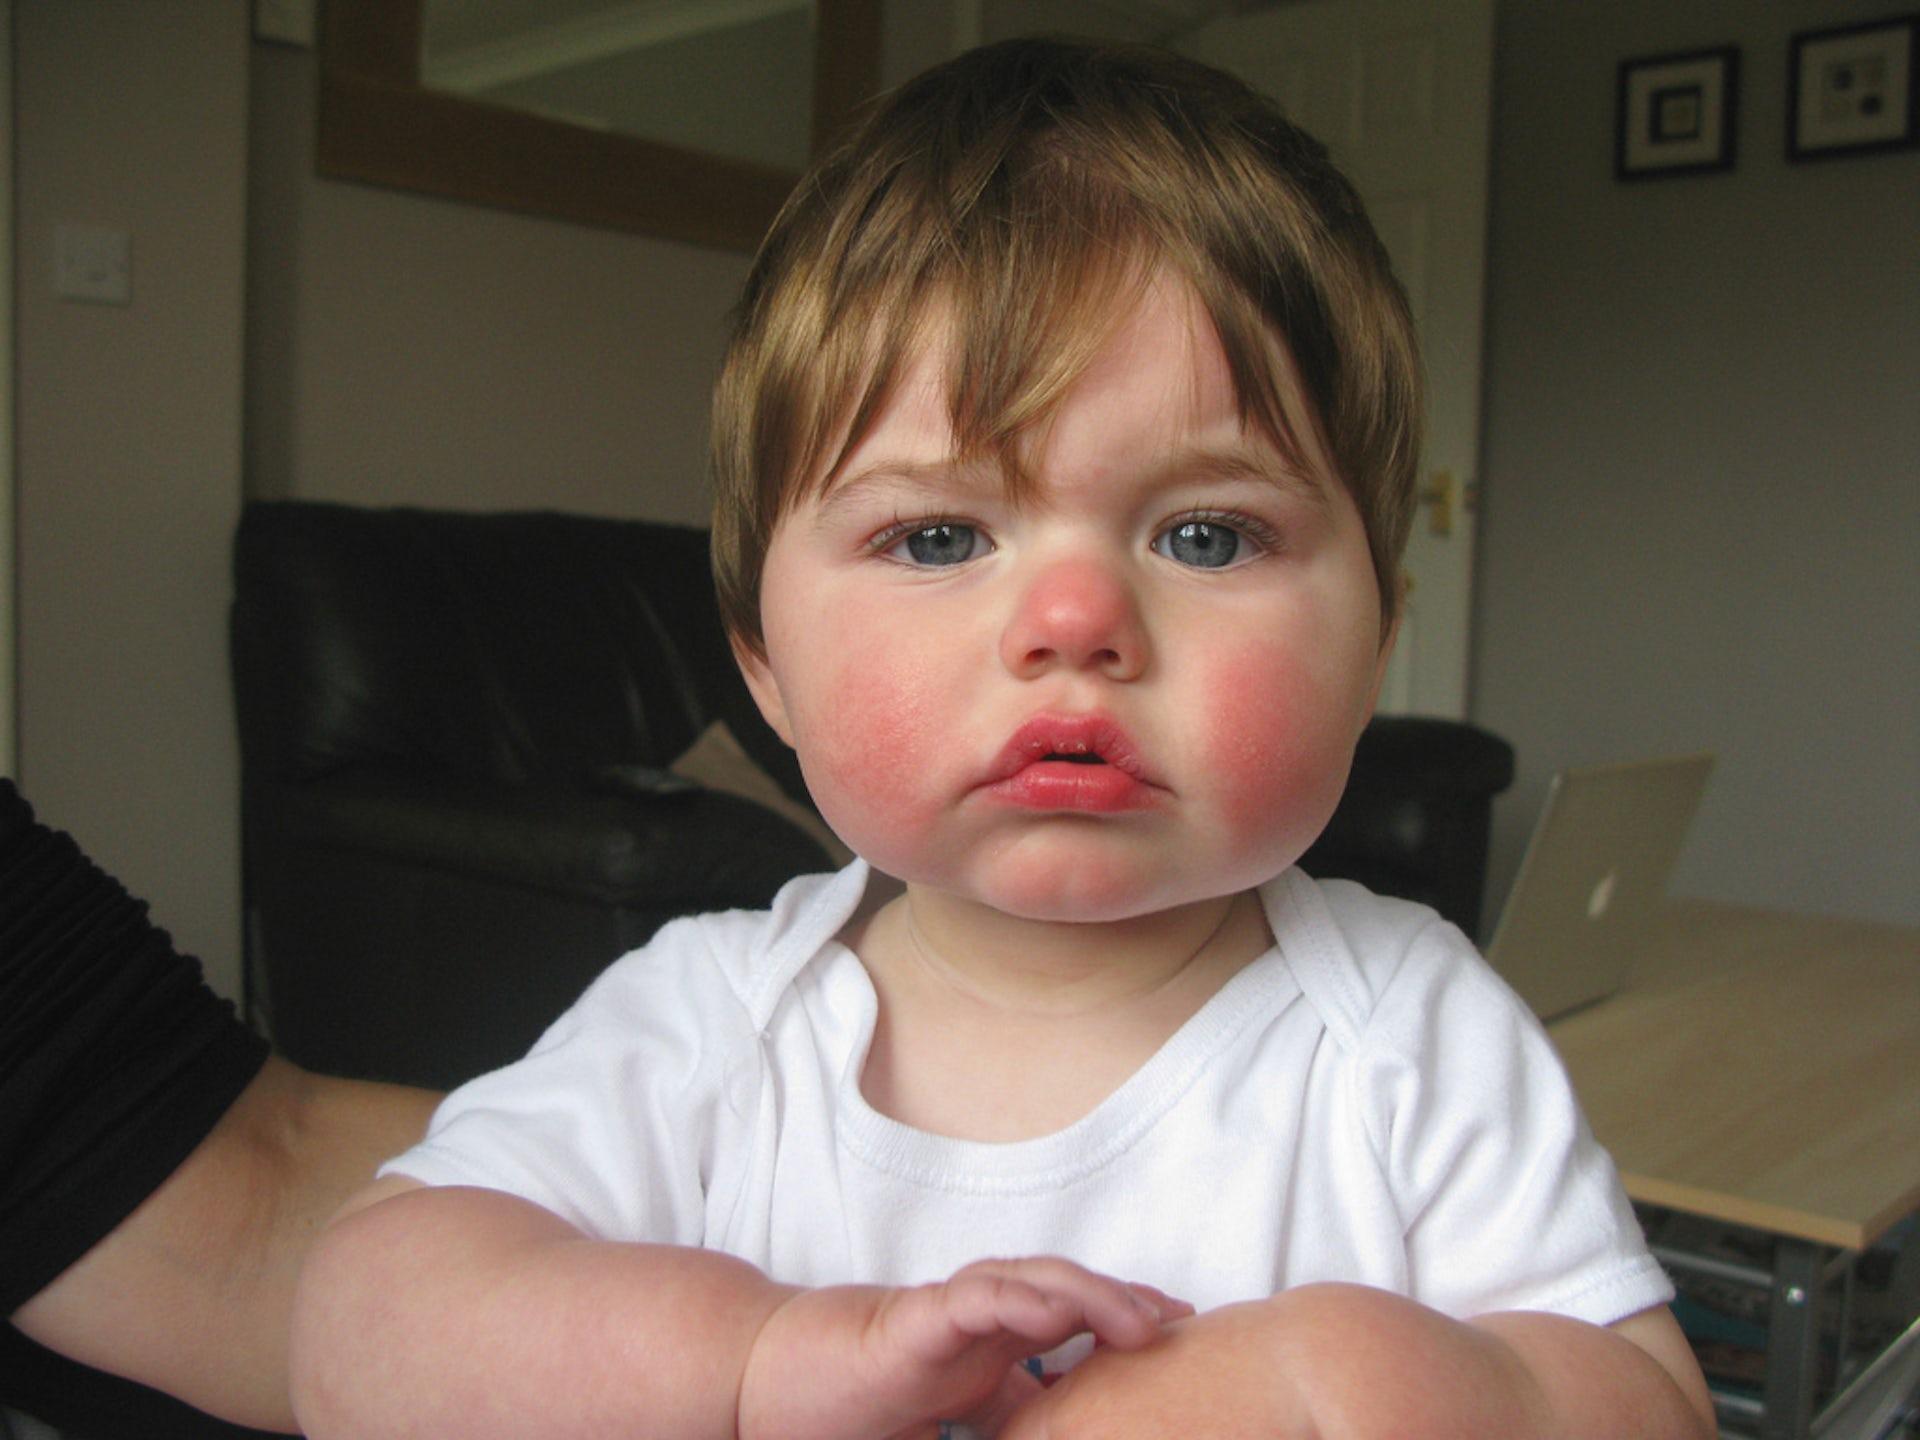 hpv skin rash on face hpv high risk infektion